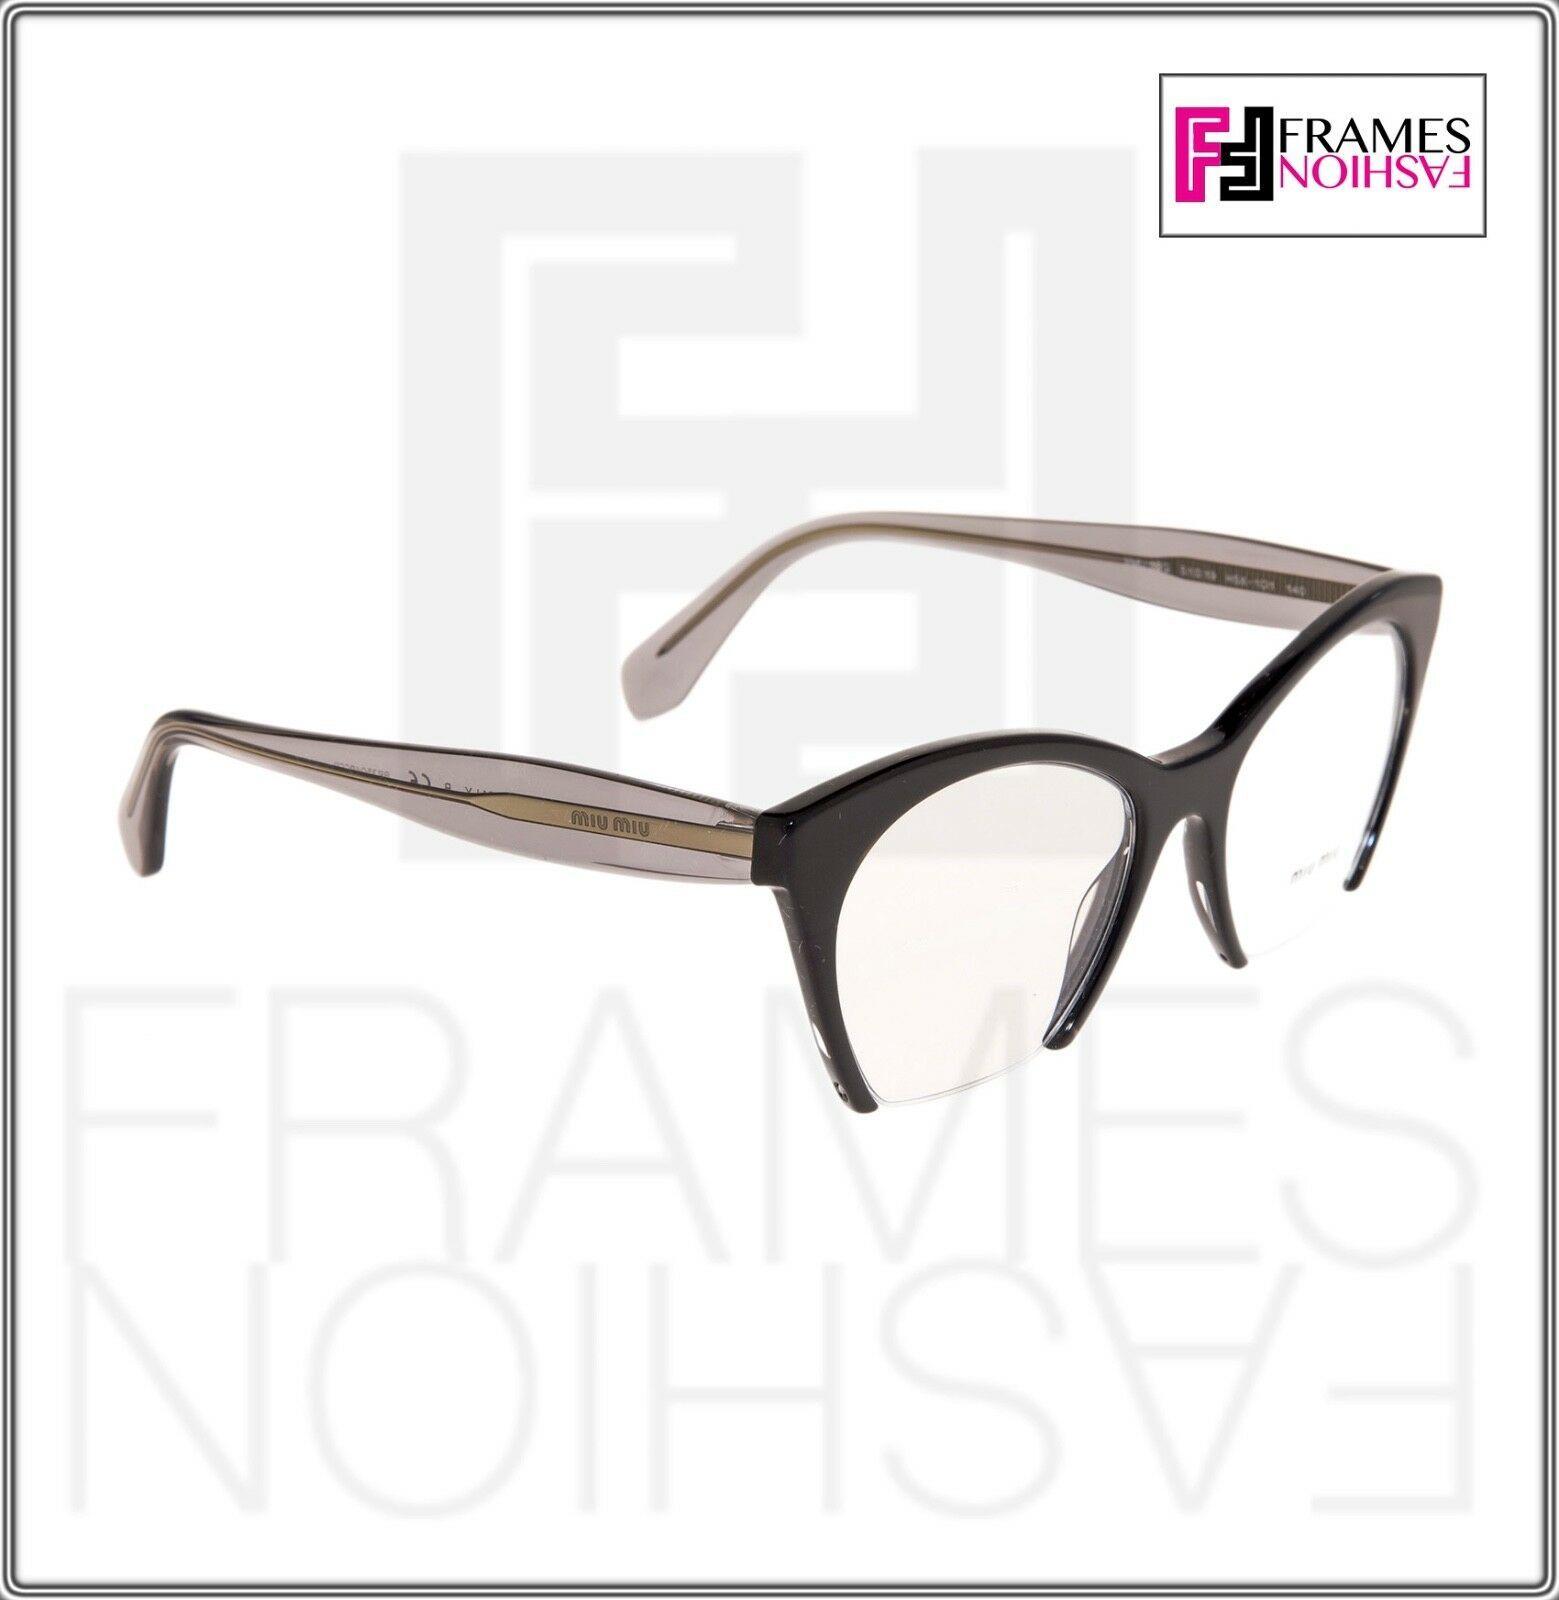 MIU MIU RASOIR MU03QV Eyeglasses Optical Frame Black Grey Translucent 51mm 03Q image 5